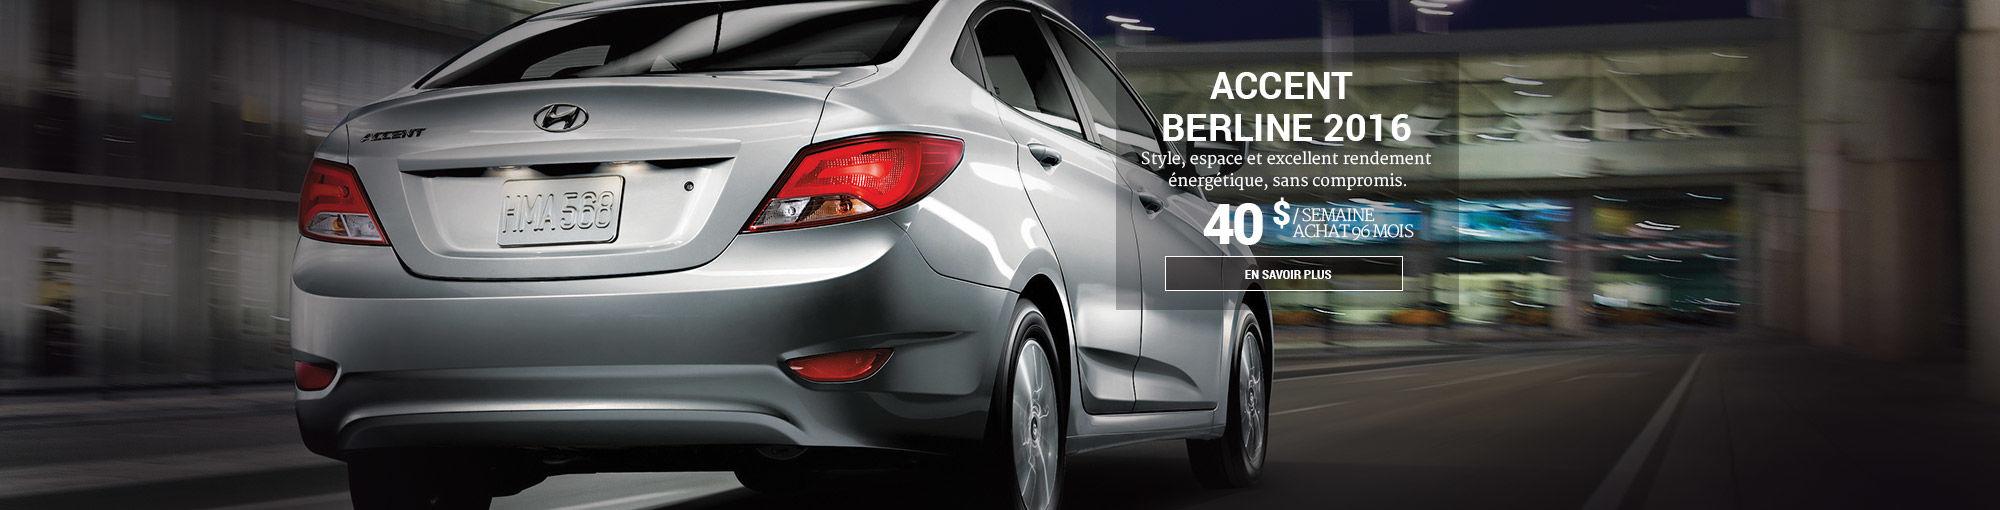 Hyundai Accent 2016 - header - octobre 2016 hsh et htr